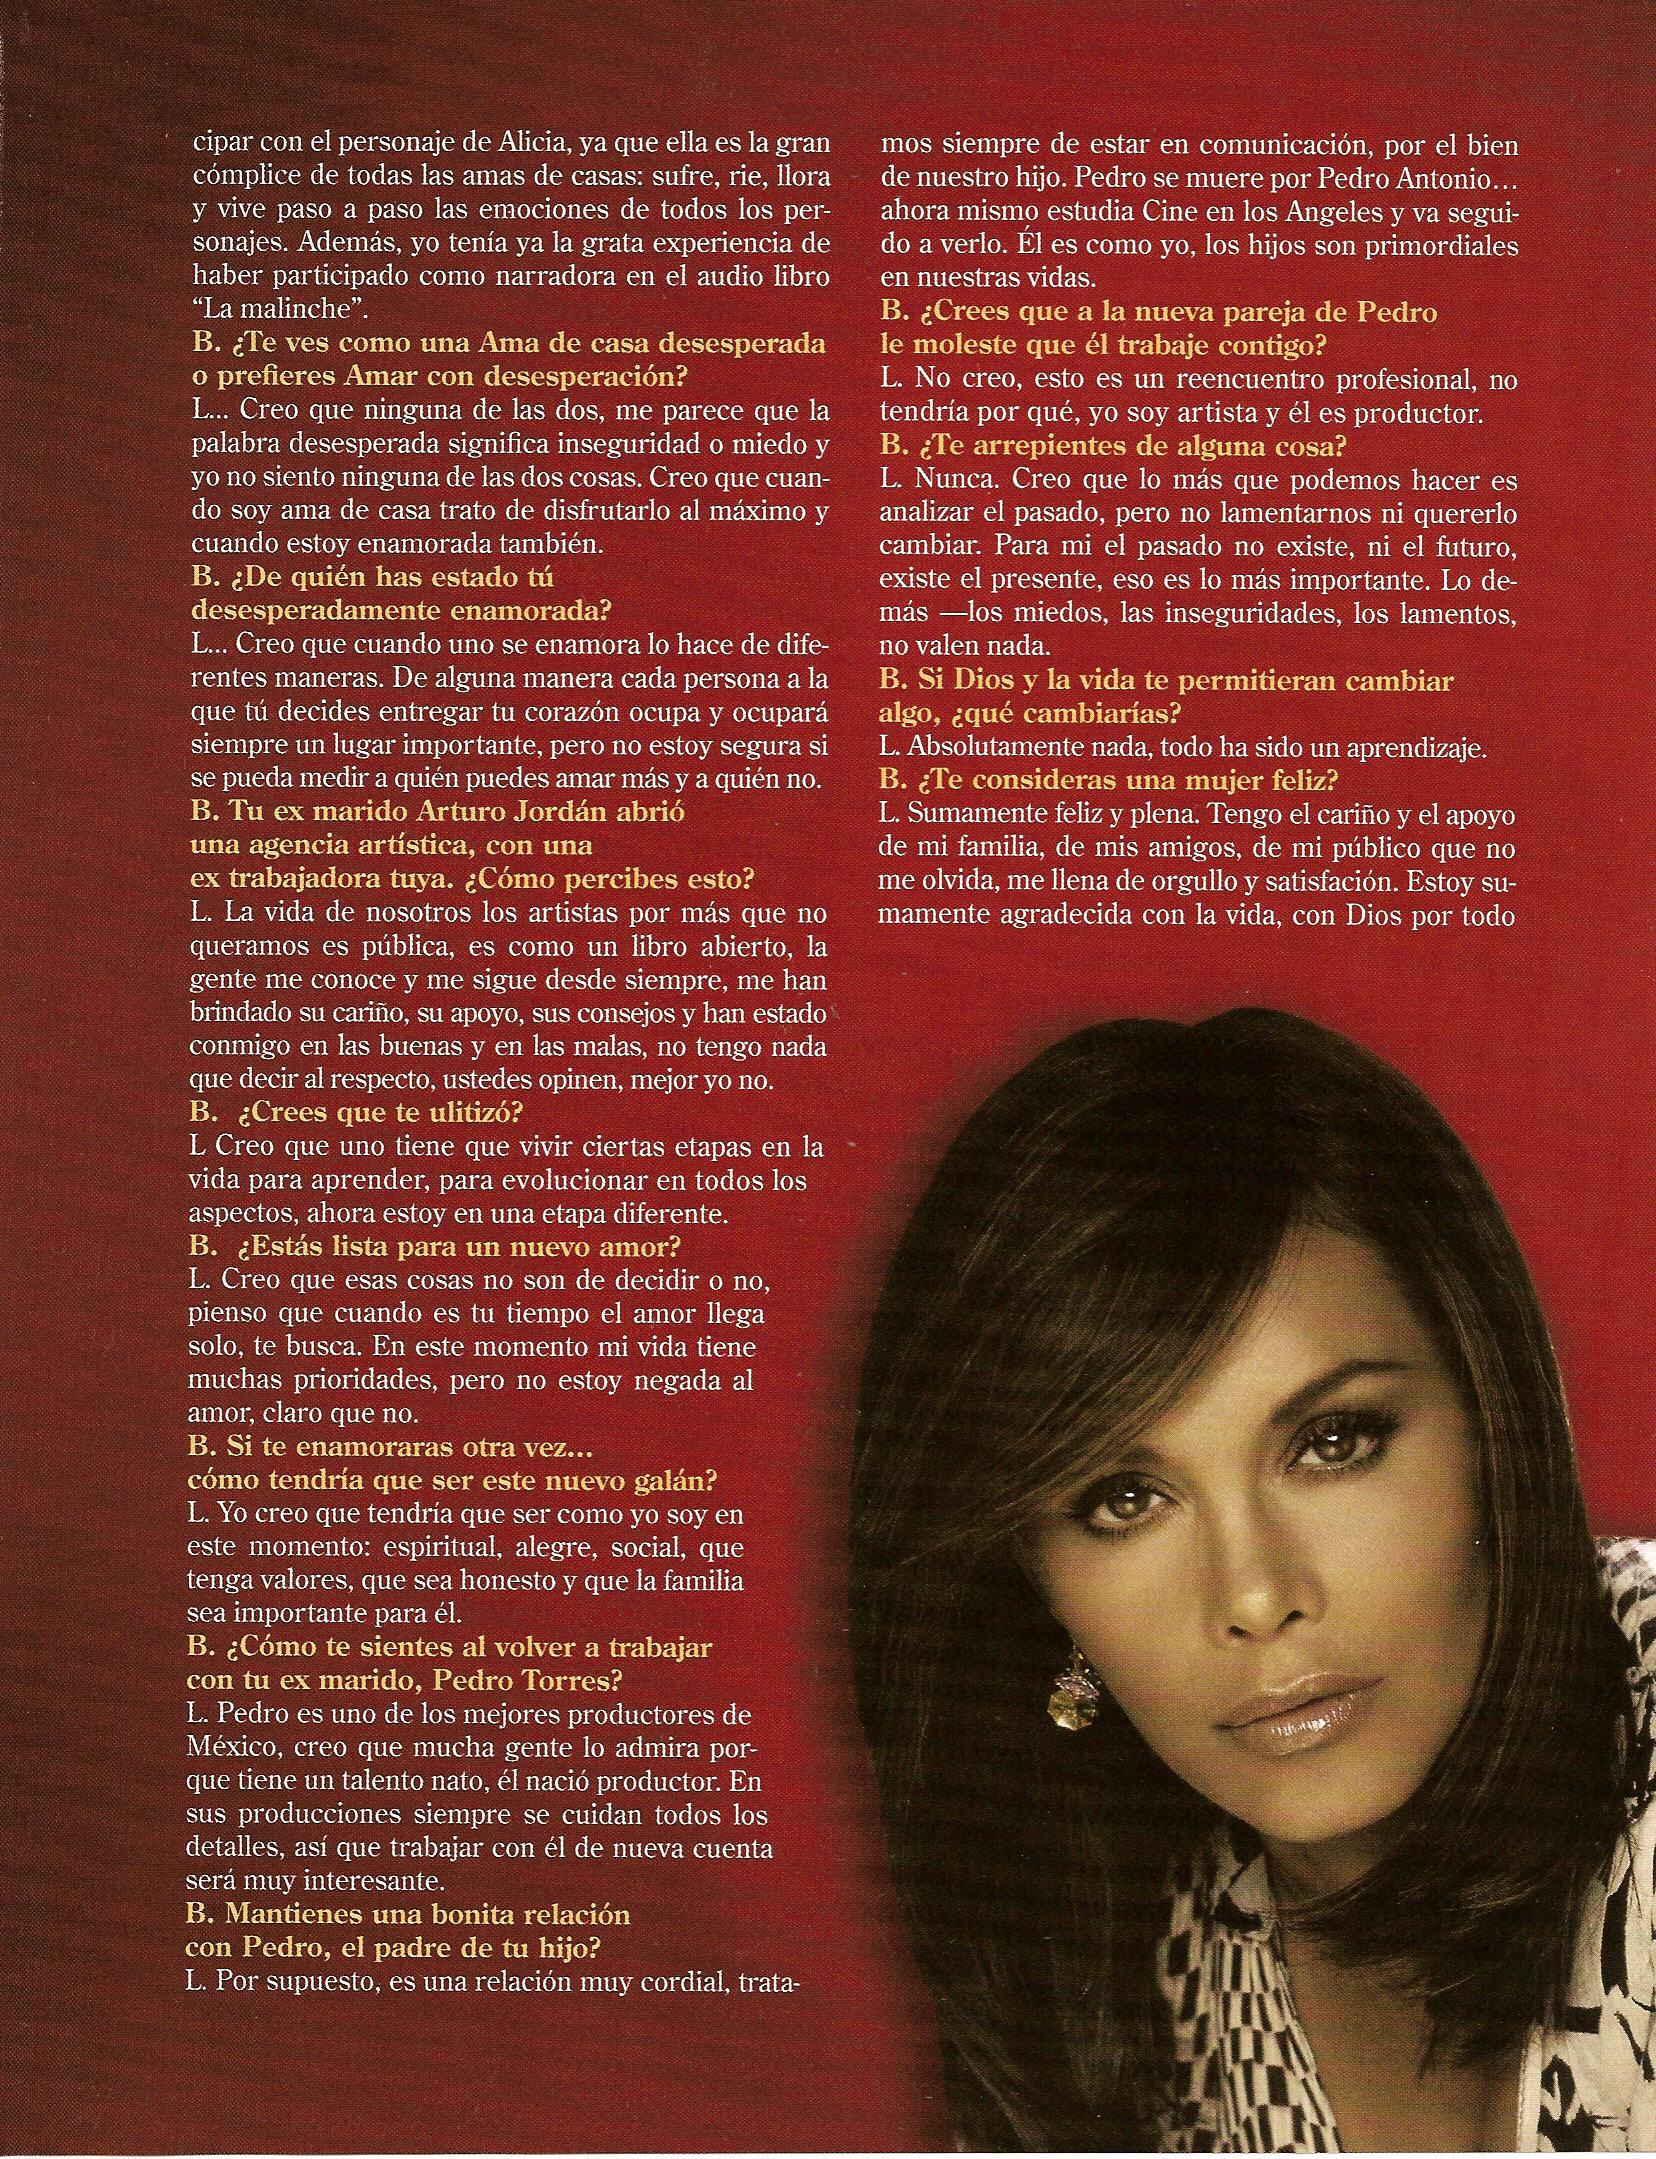 Лусия Мендес/Lucia Mendez  - Страница 32 1c1152be069d